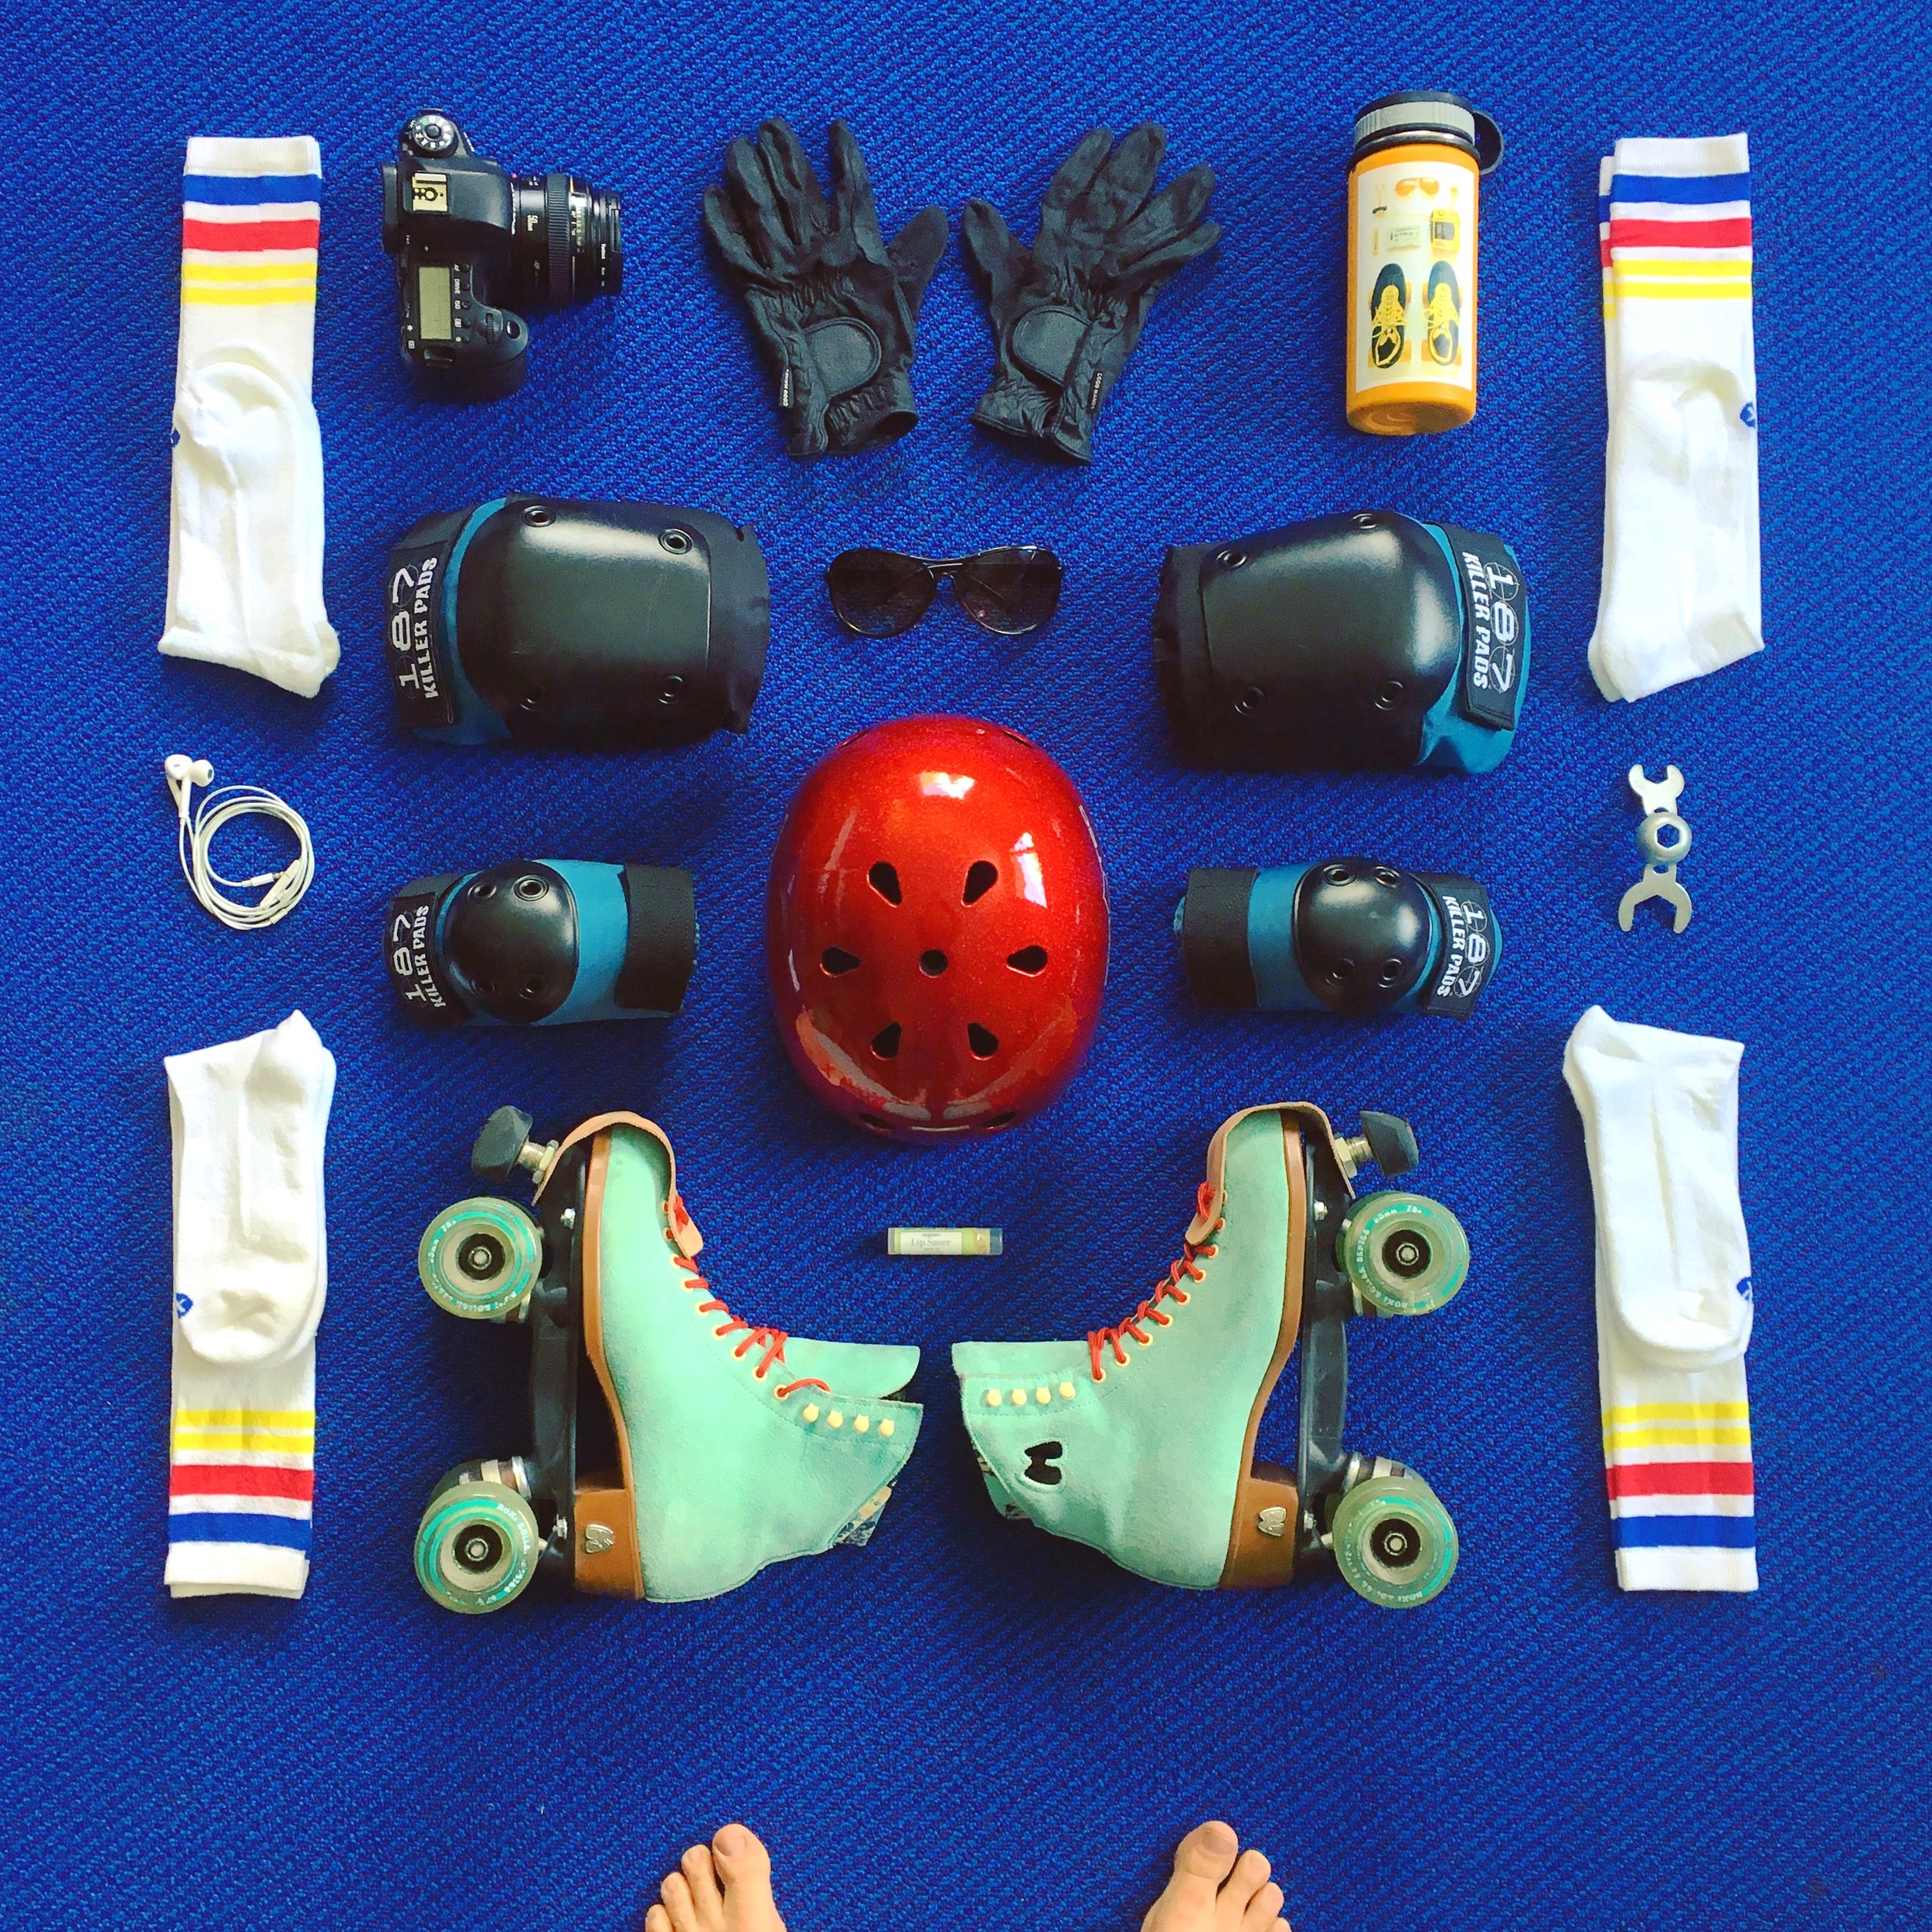 Packing for Moxi Roller Skate Camp